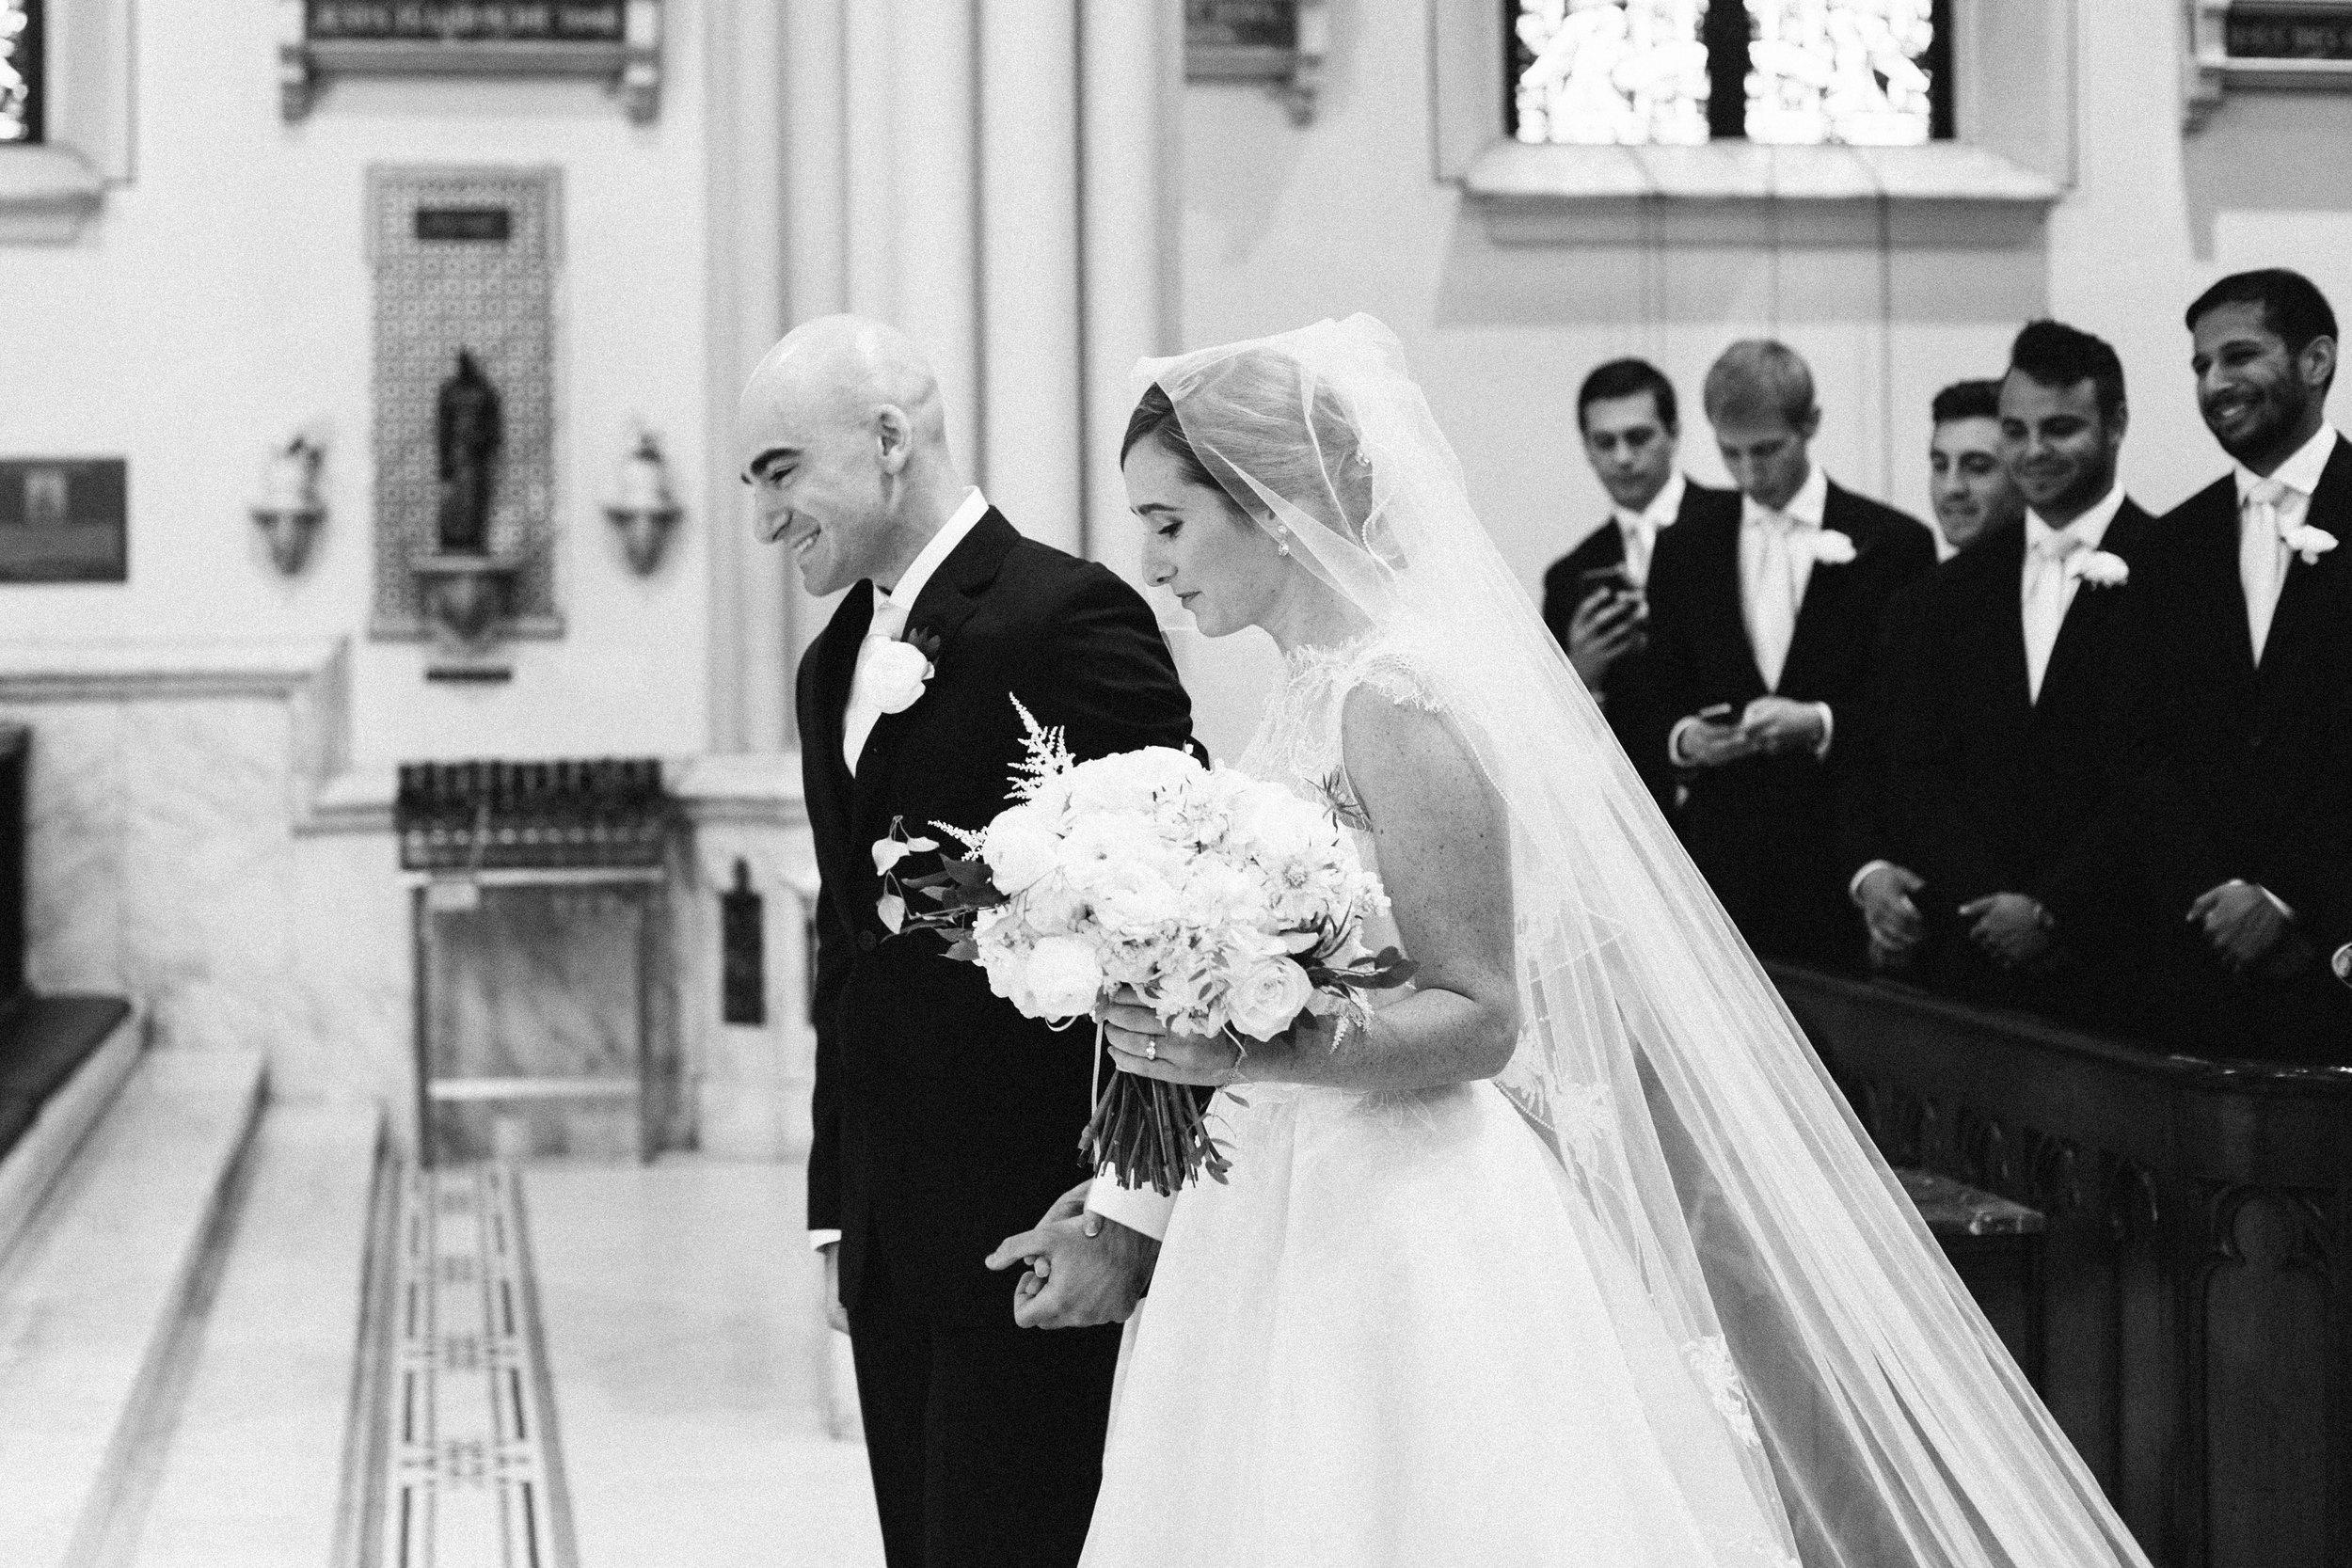 017-MA17_St-Marys-Catholic-Church-Annapolis-Wedding.jpg